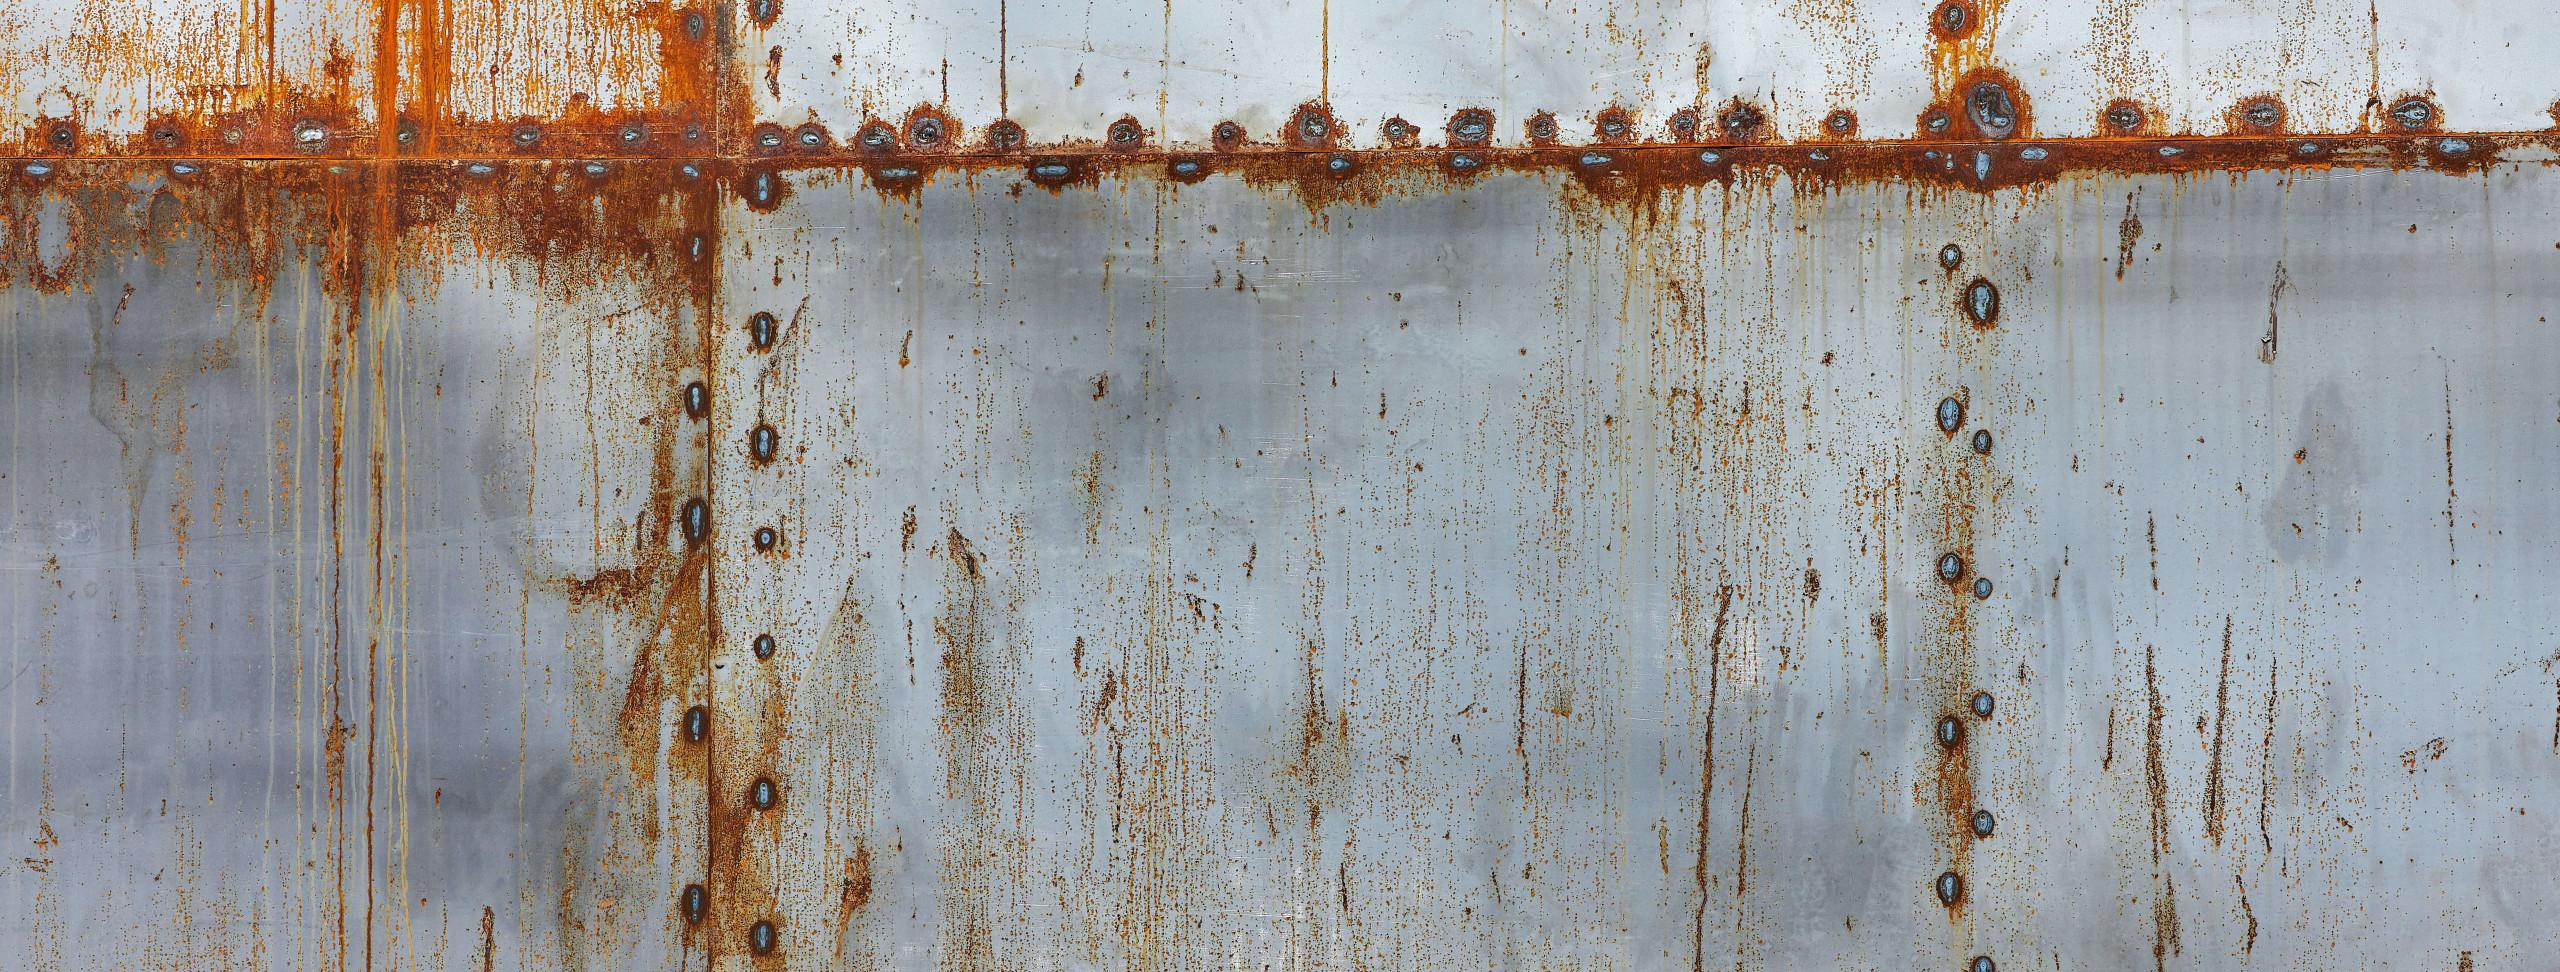 ferrugem-metal-superficie-metalica-combater-limpeza-remover